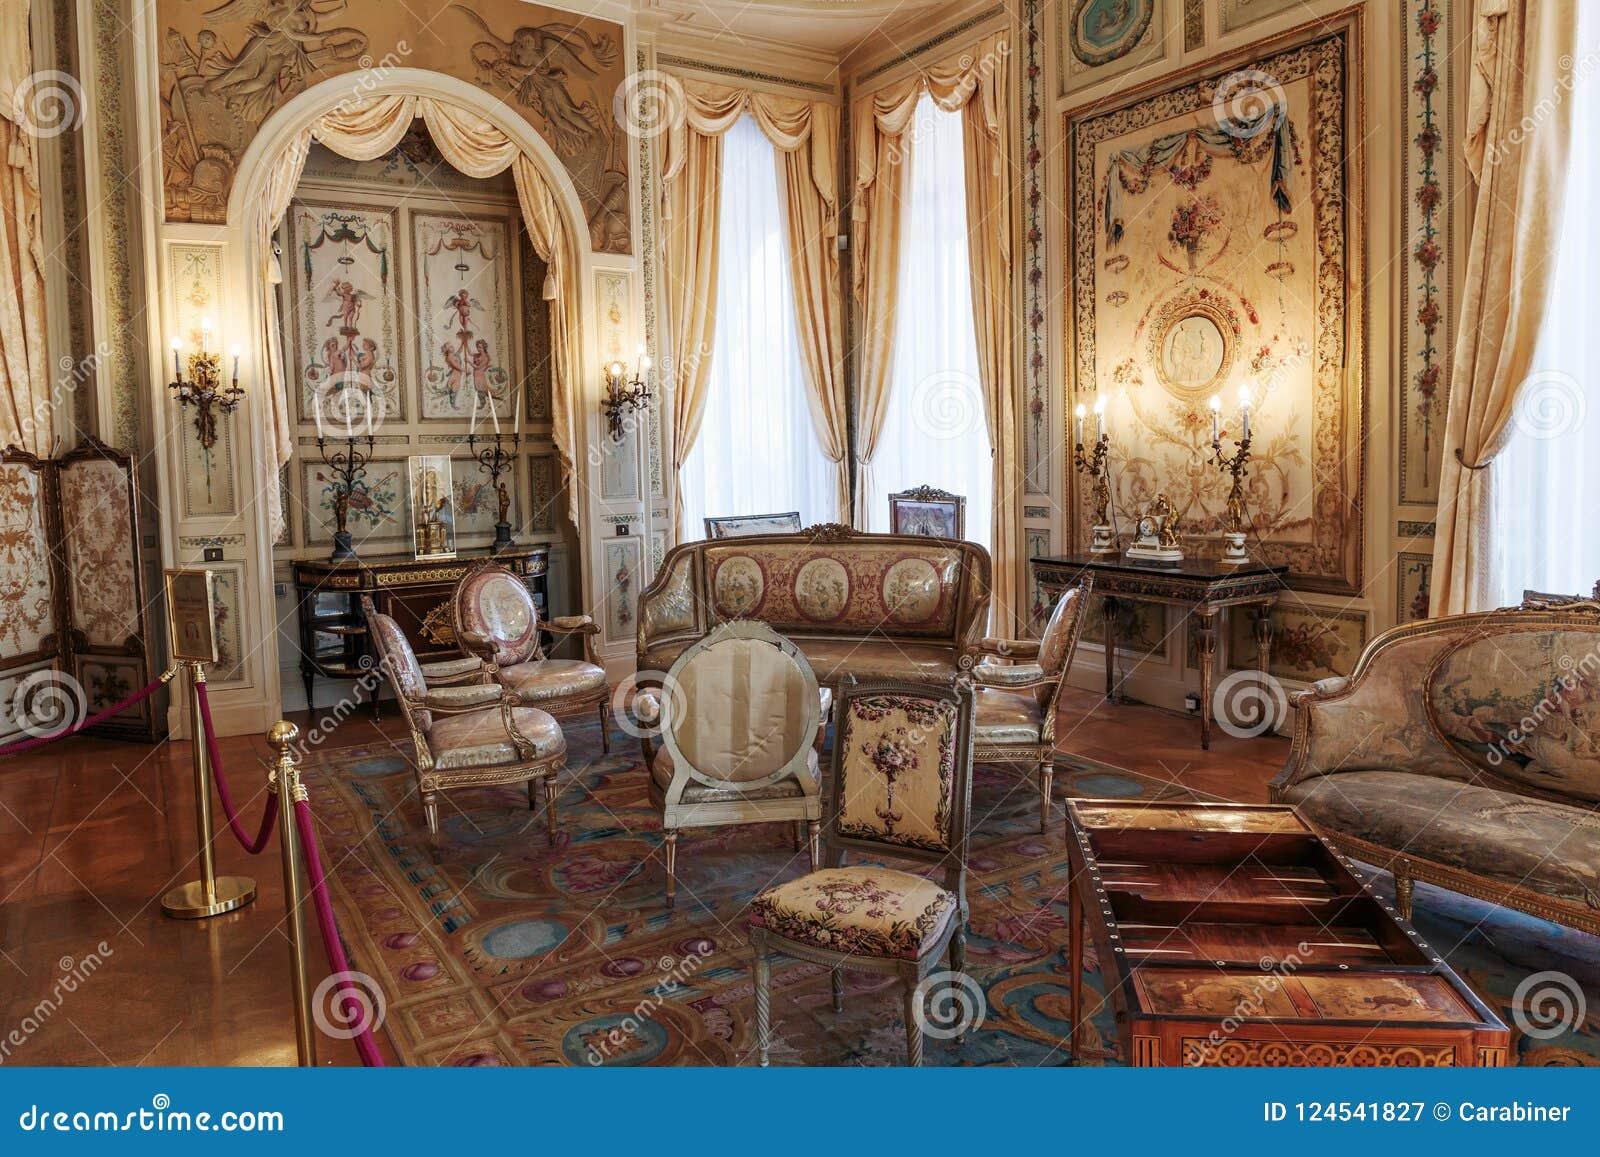 Villa Ephrussi de Rothschild inre